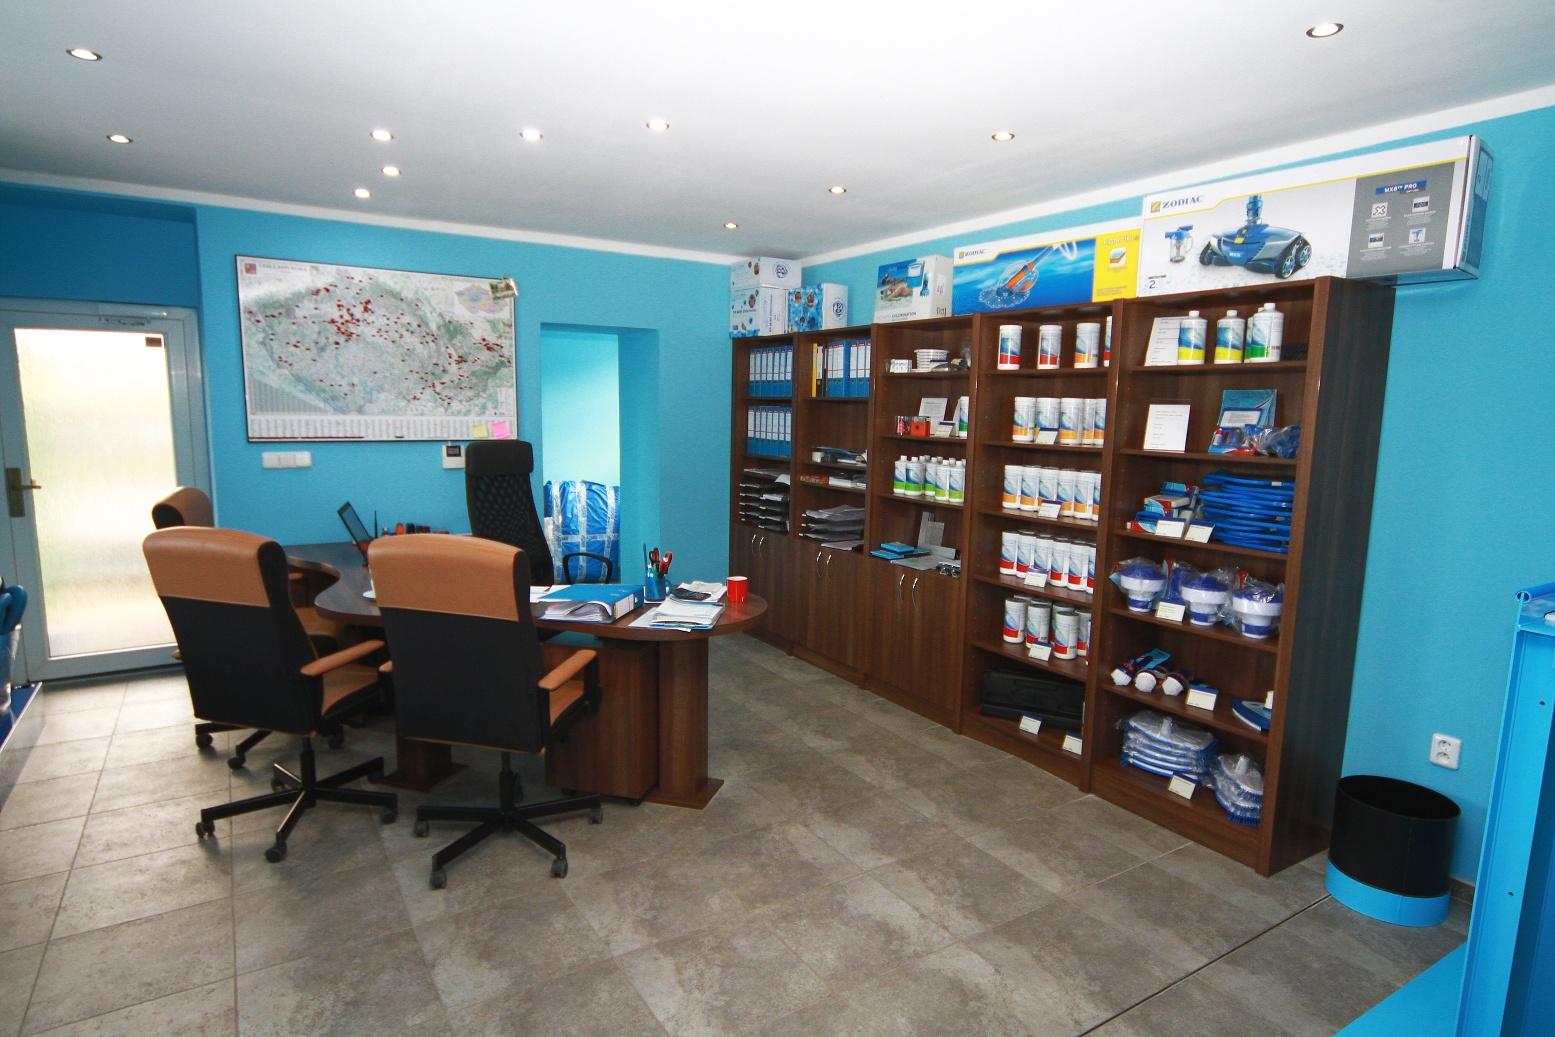 Výroba plastových bazénů - Chrást Tišice - Výroba a prodej